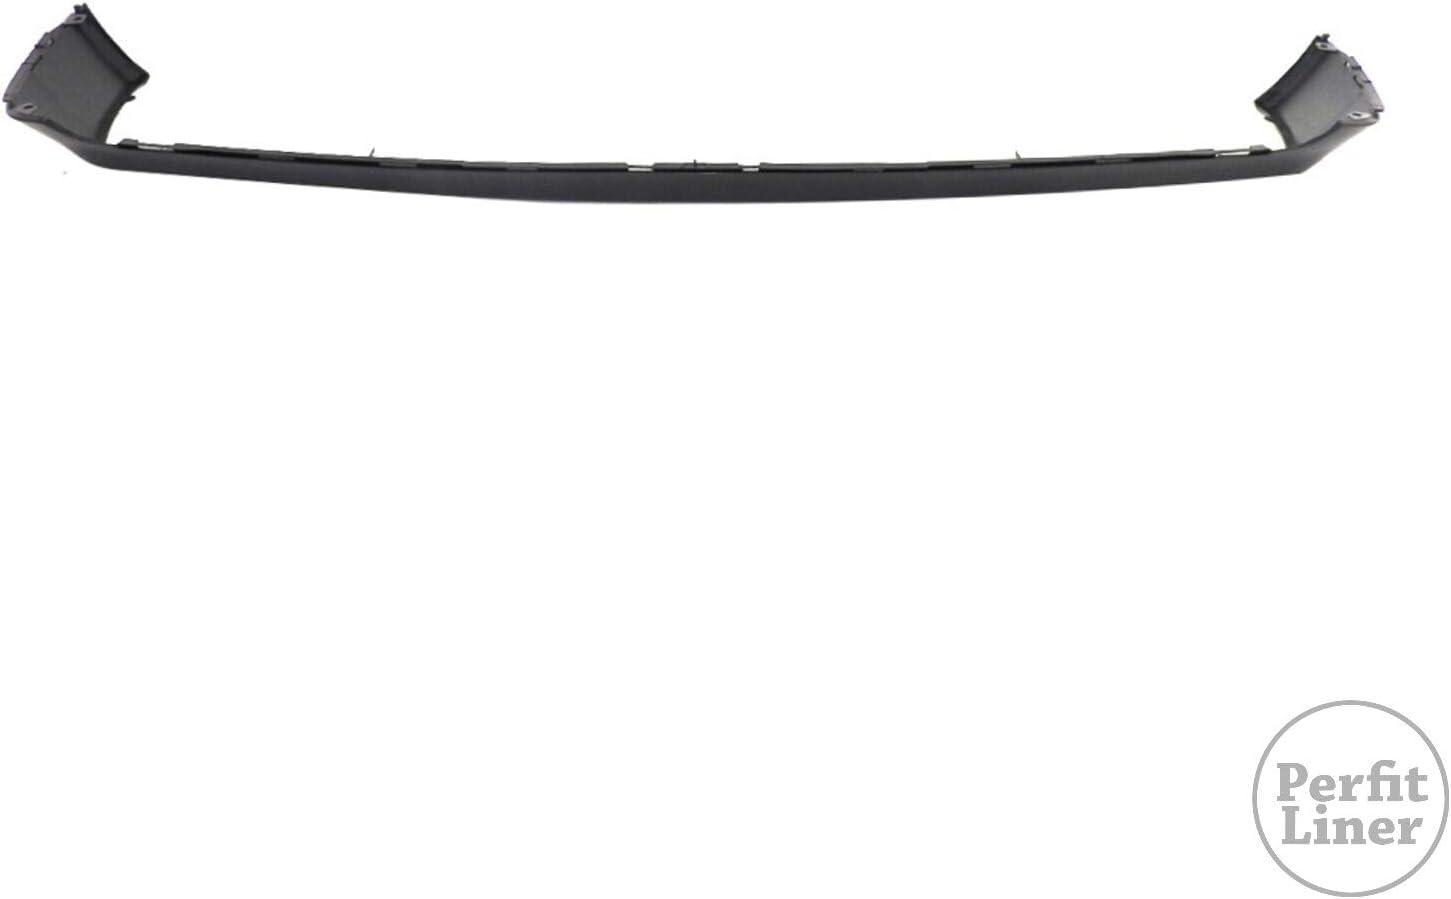 Perfit Liner New Replacement Parts Front Black Primed Bumper Valance Compatible With MERCEDES Benz W210 E Class Sedan Wagon E300 E320 E420 E430 Fits MB1095103 2108850725